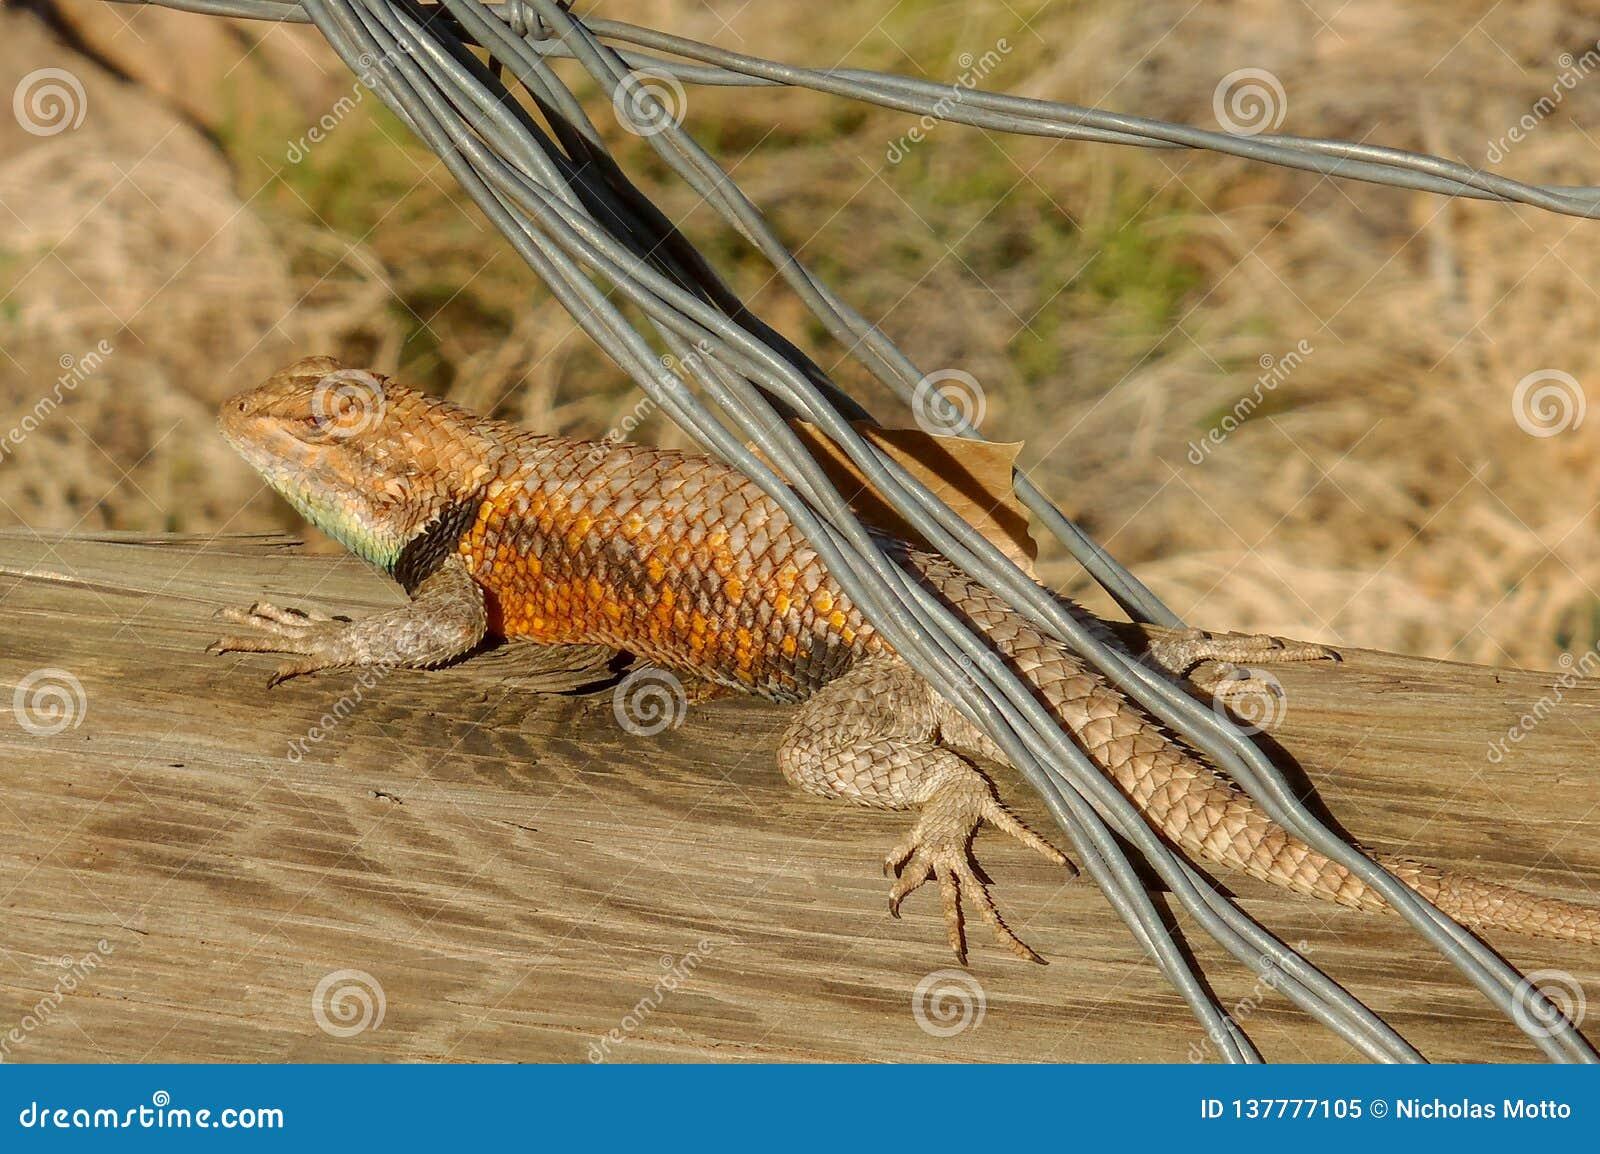 Desert Spiny Lizard on a Fence Rail